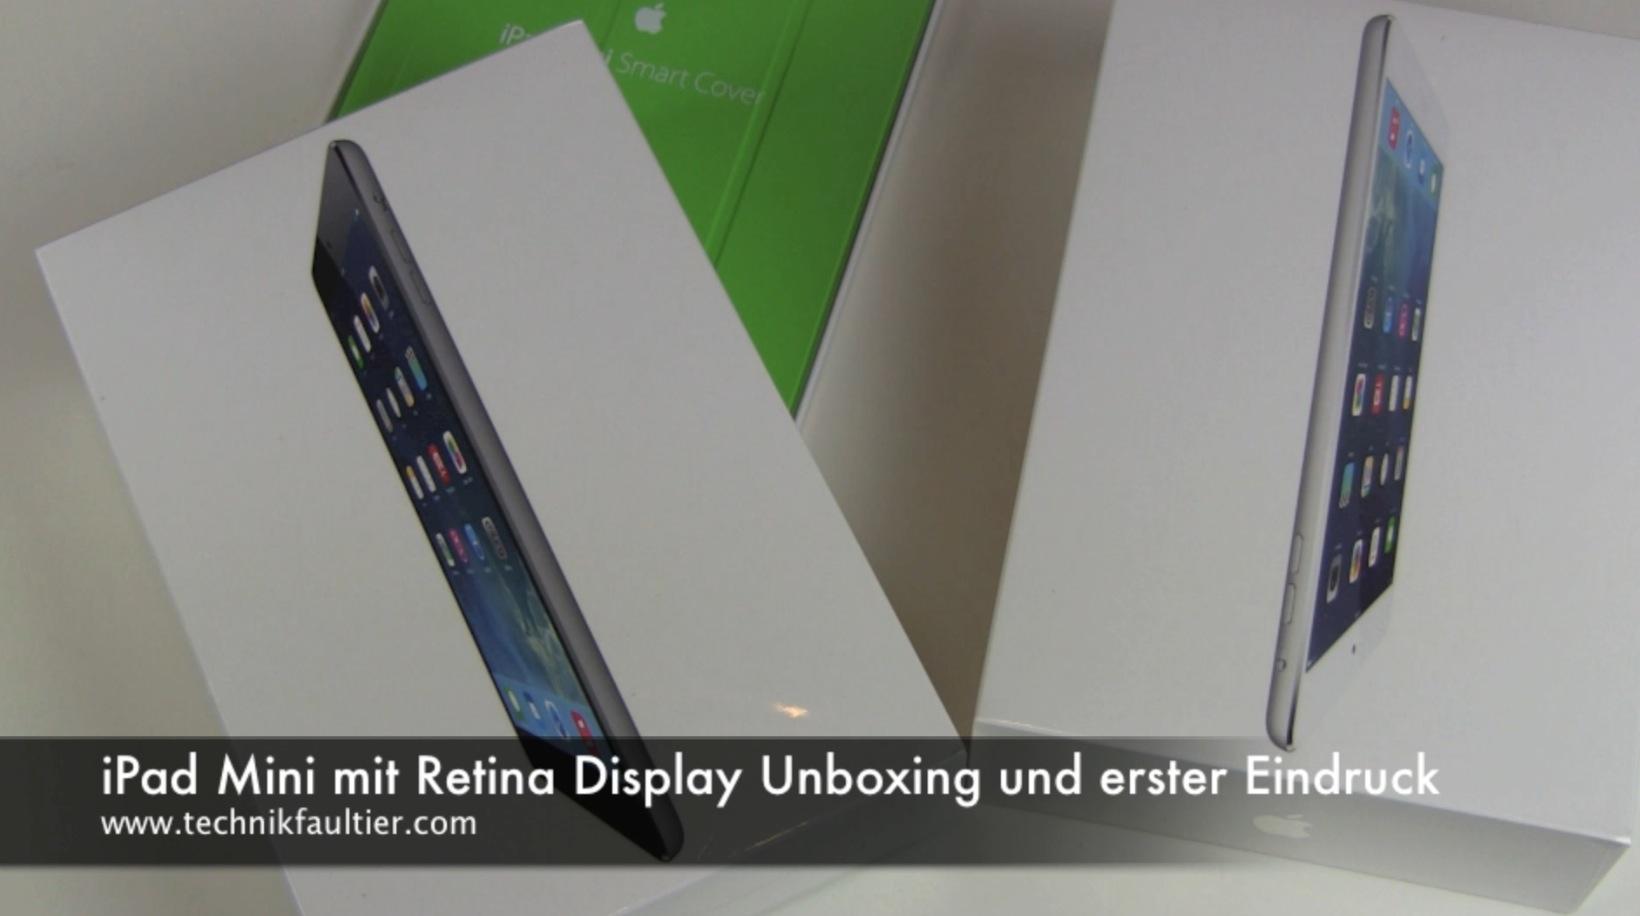 ipad mini mit retina display wei unboxing und erster. Black Bedroom Furniture Sets. Home Design Ideas